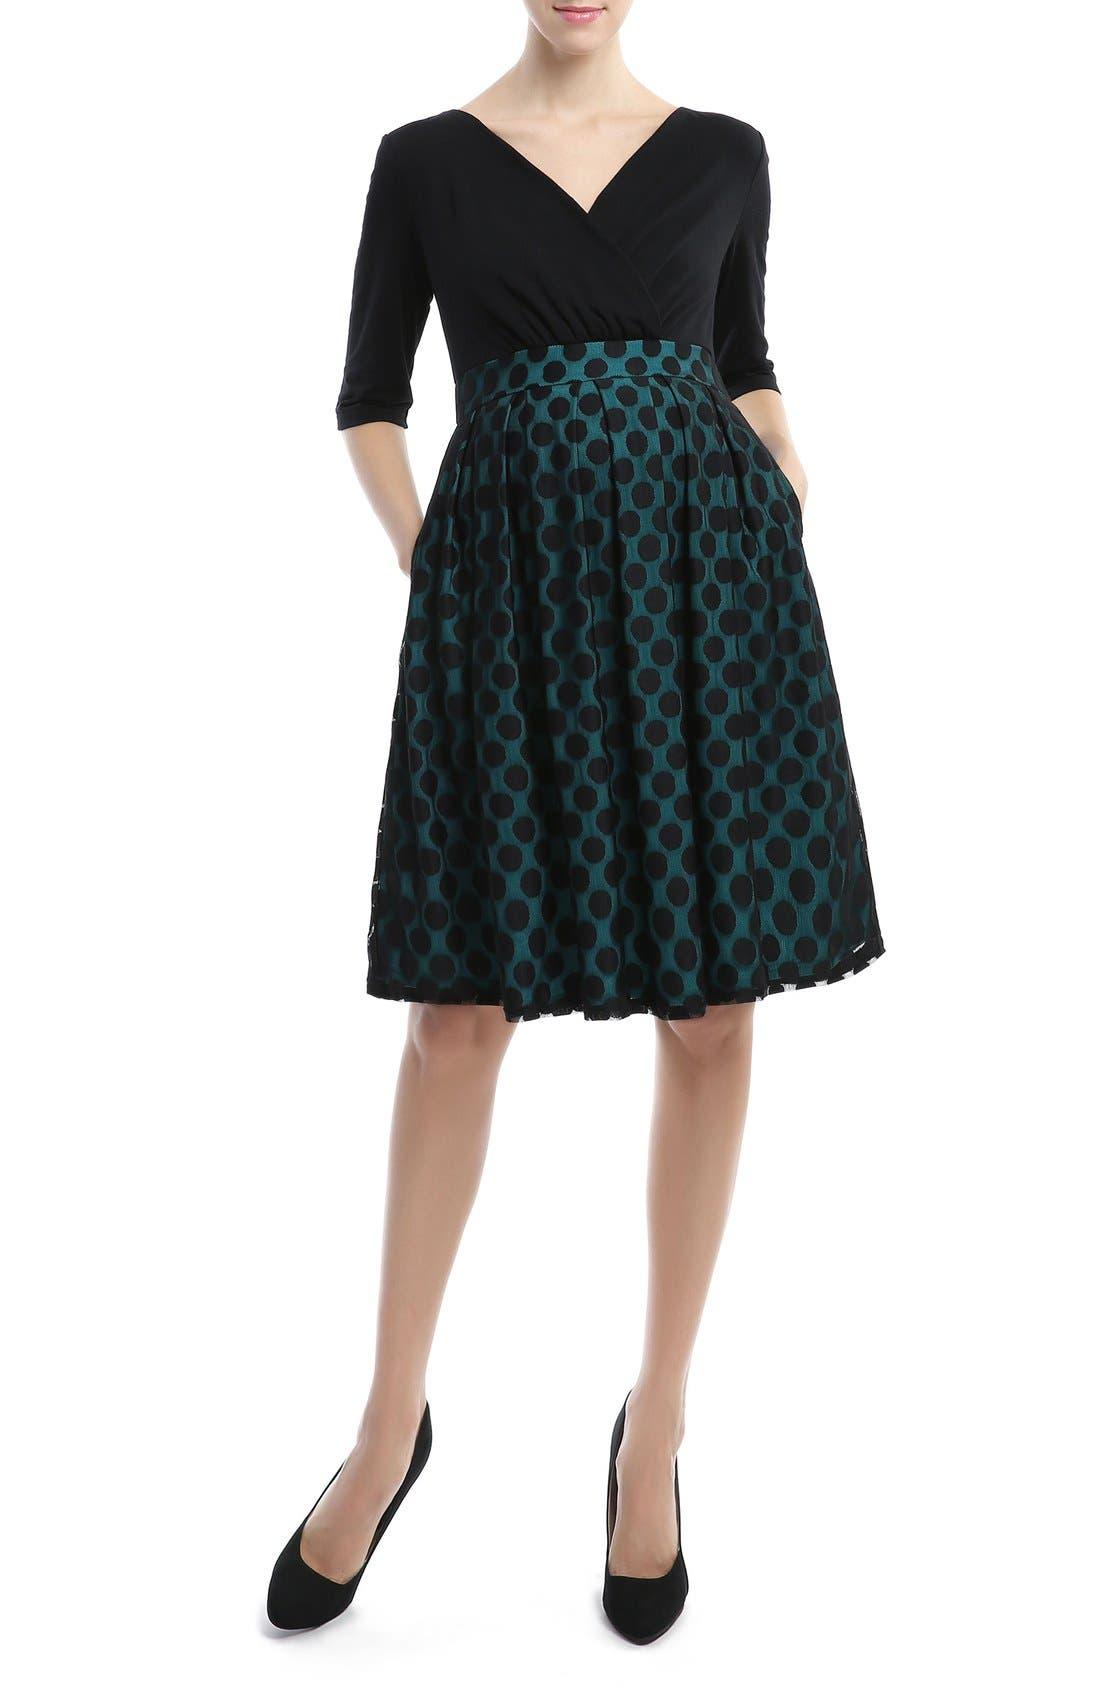 'Liliana' Polka Dot Lace Maternity Dress,                         Main,                         color, Black/ Teal